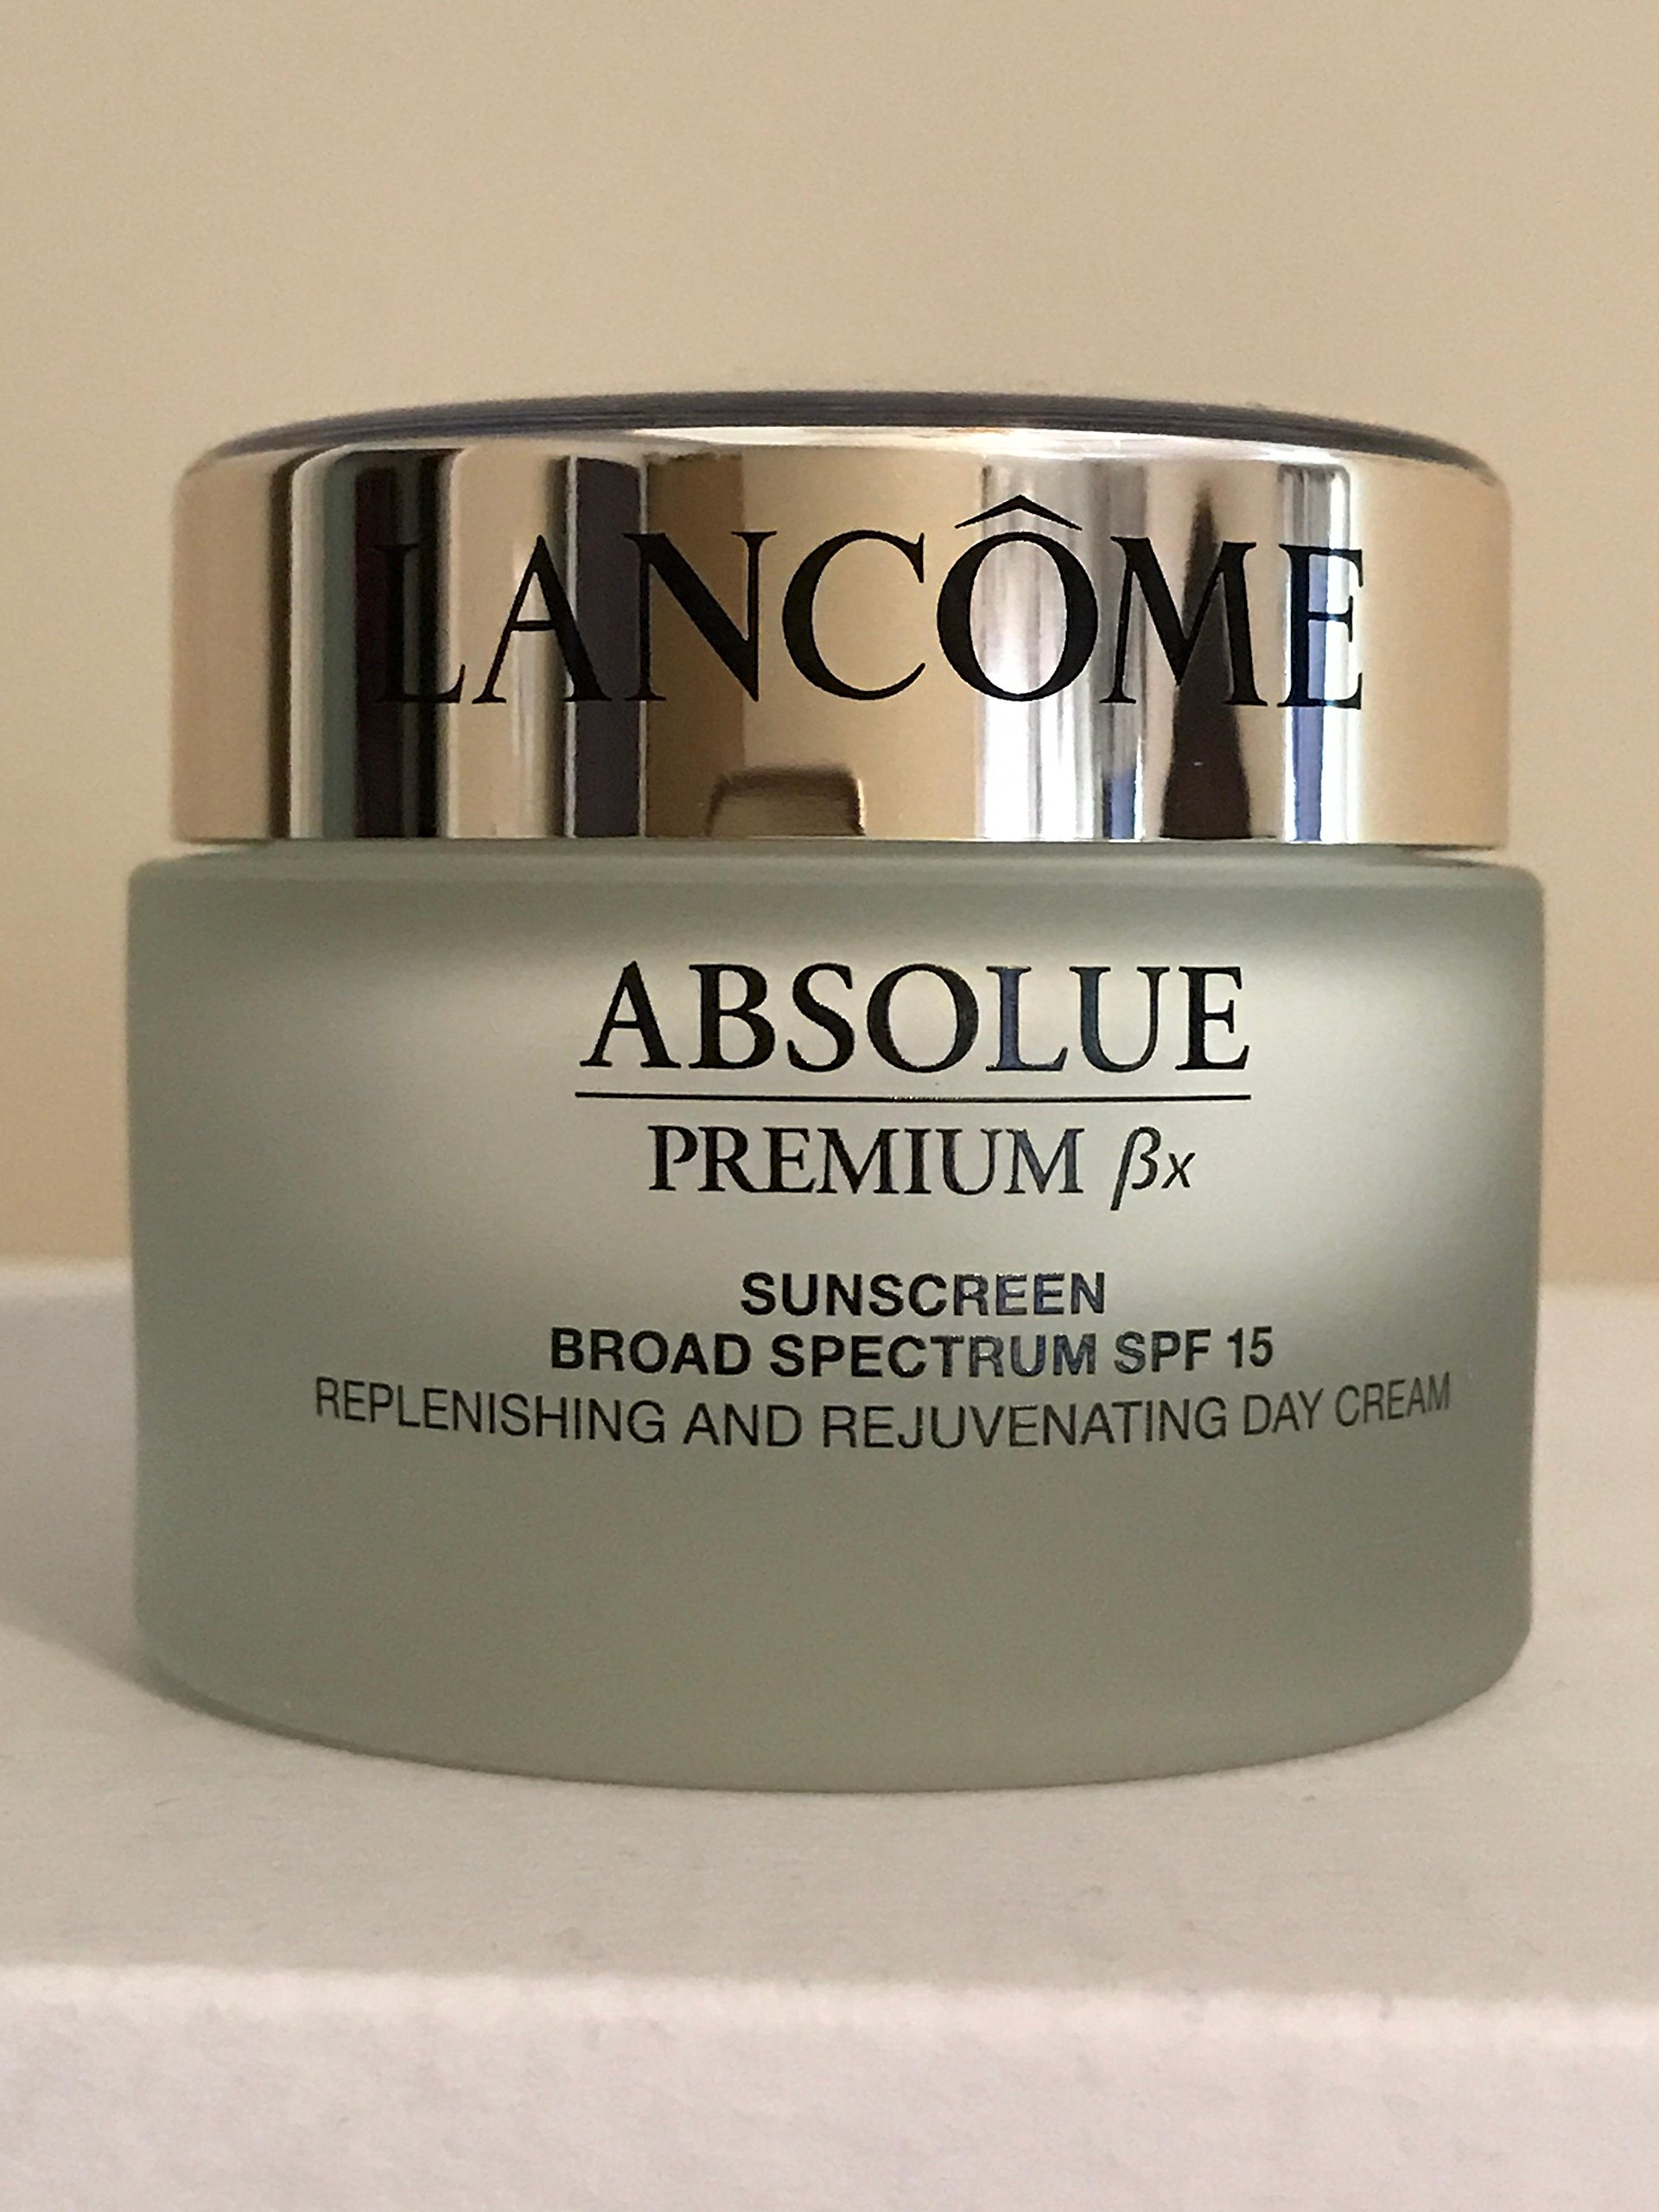 Absolue Premium Bx Replenishing and Rejuvenating Day Cream 1.7oz